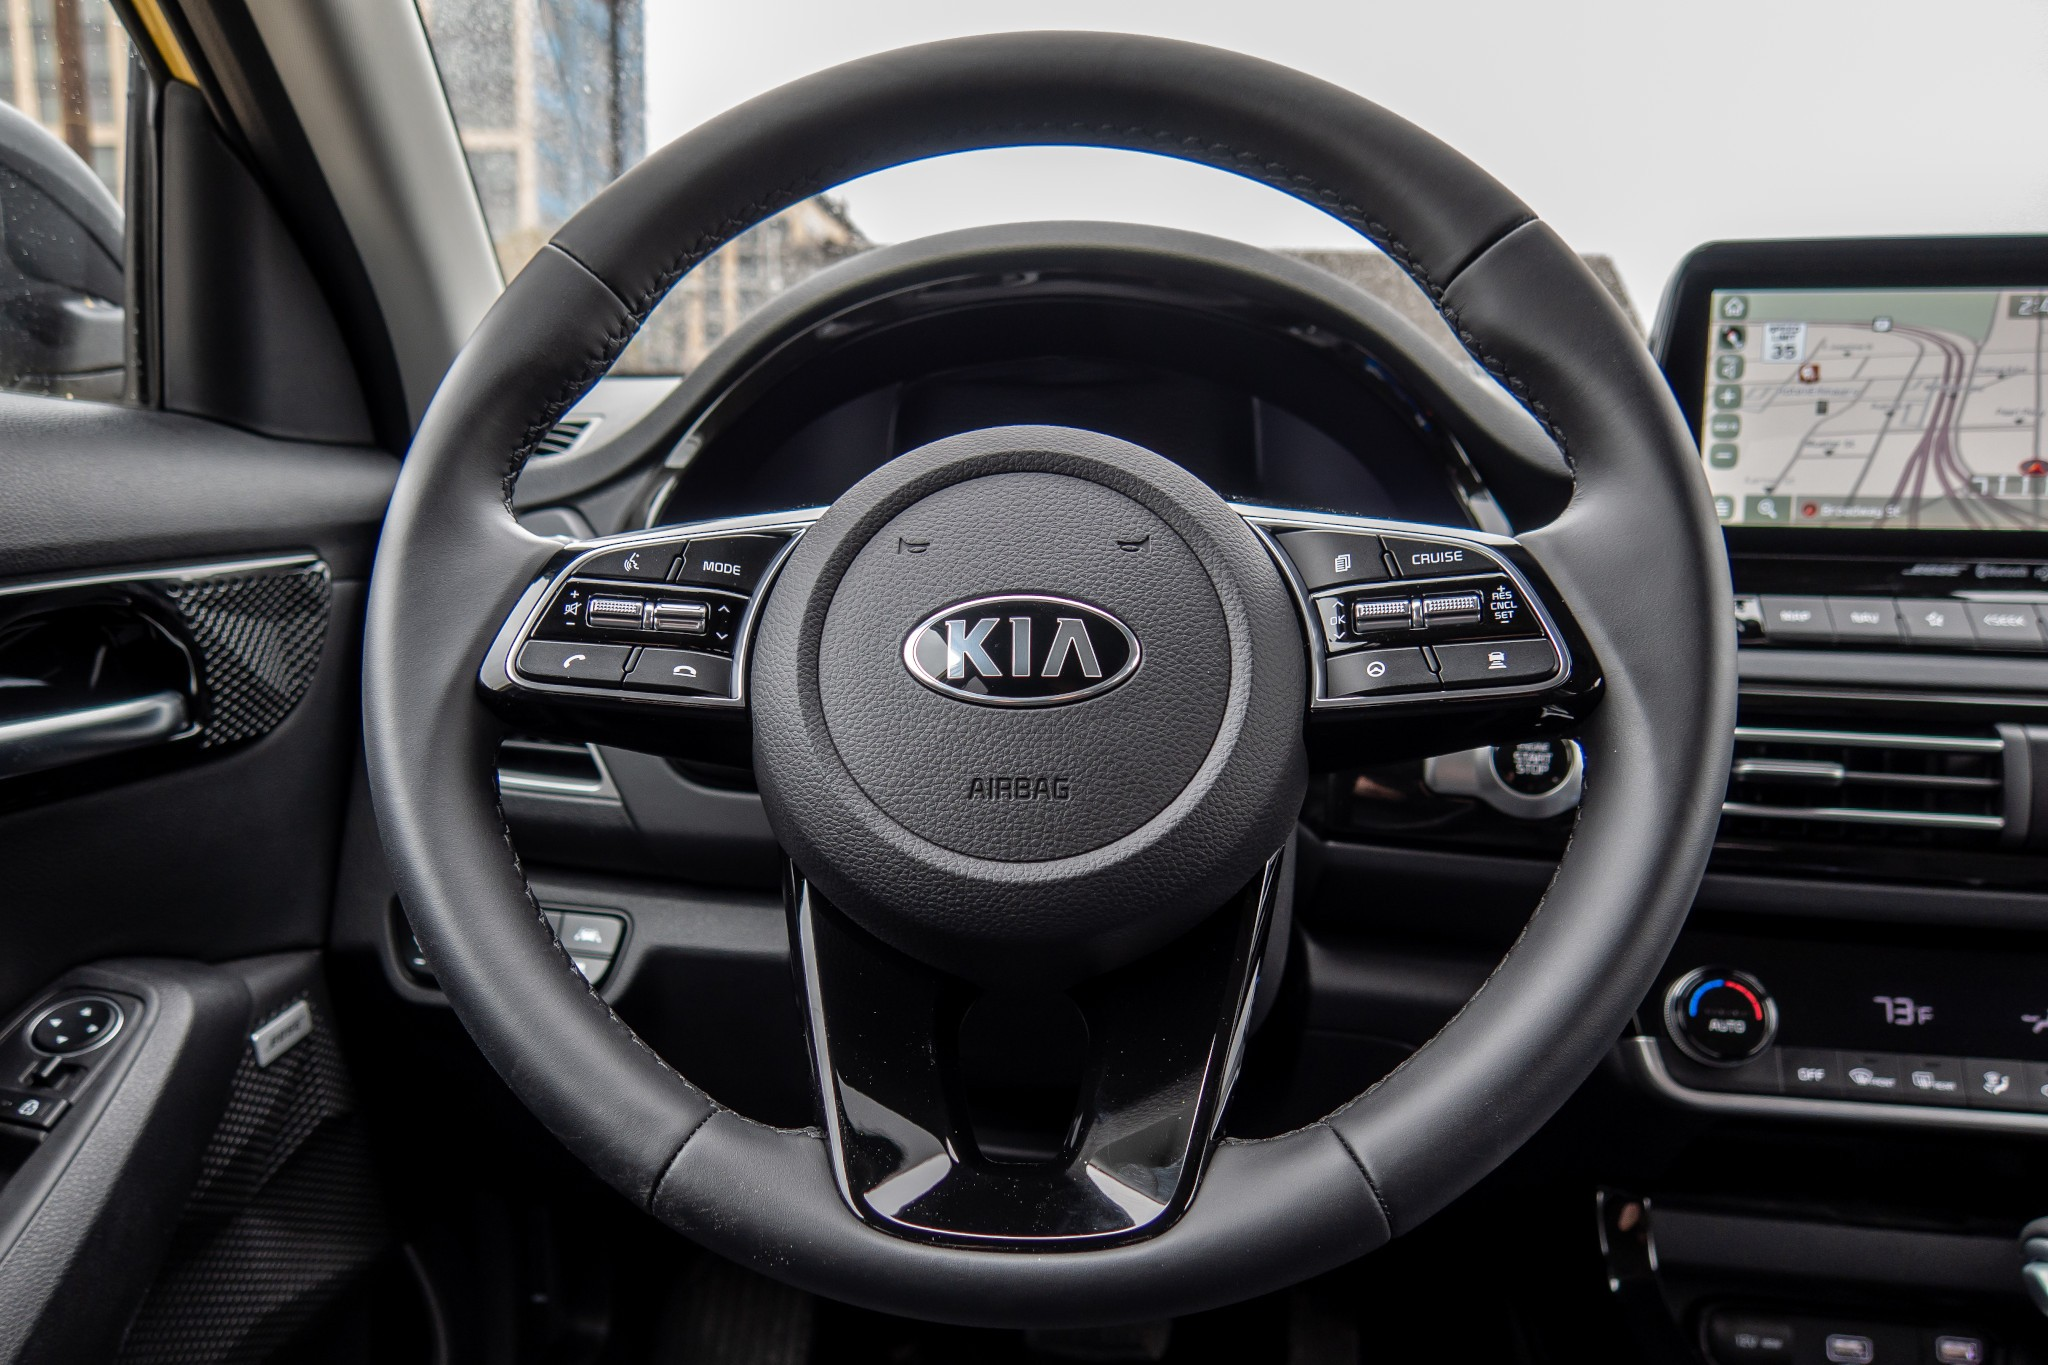 kia-seltos-2021-26-badge--front-row--interior--steering-wheel.jpg